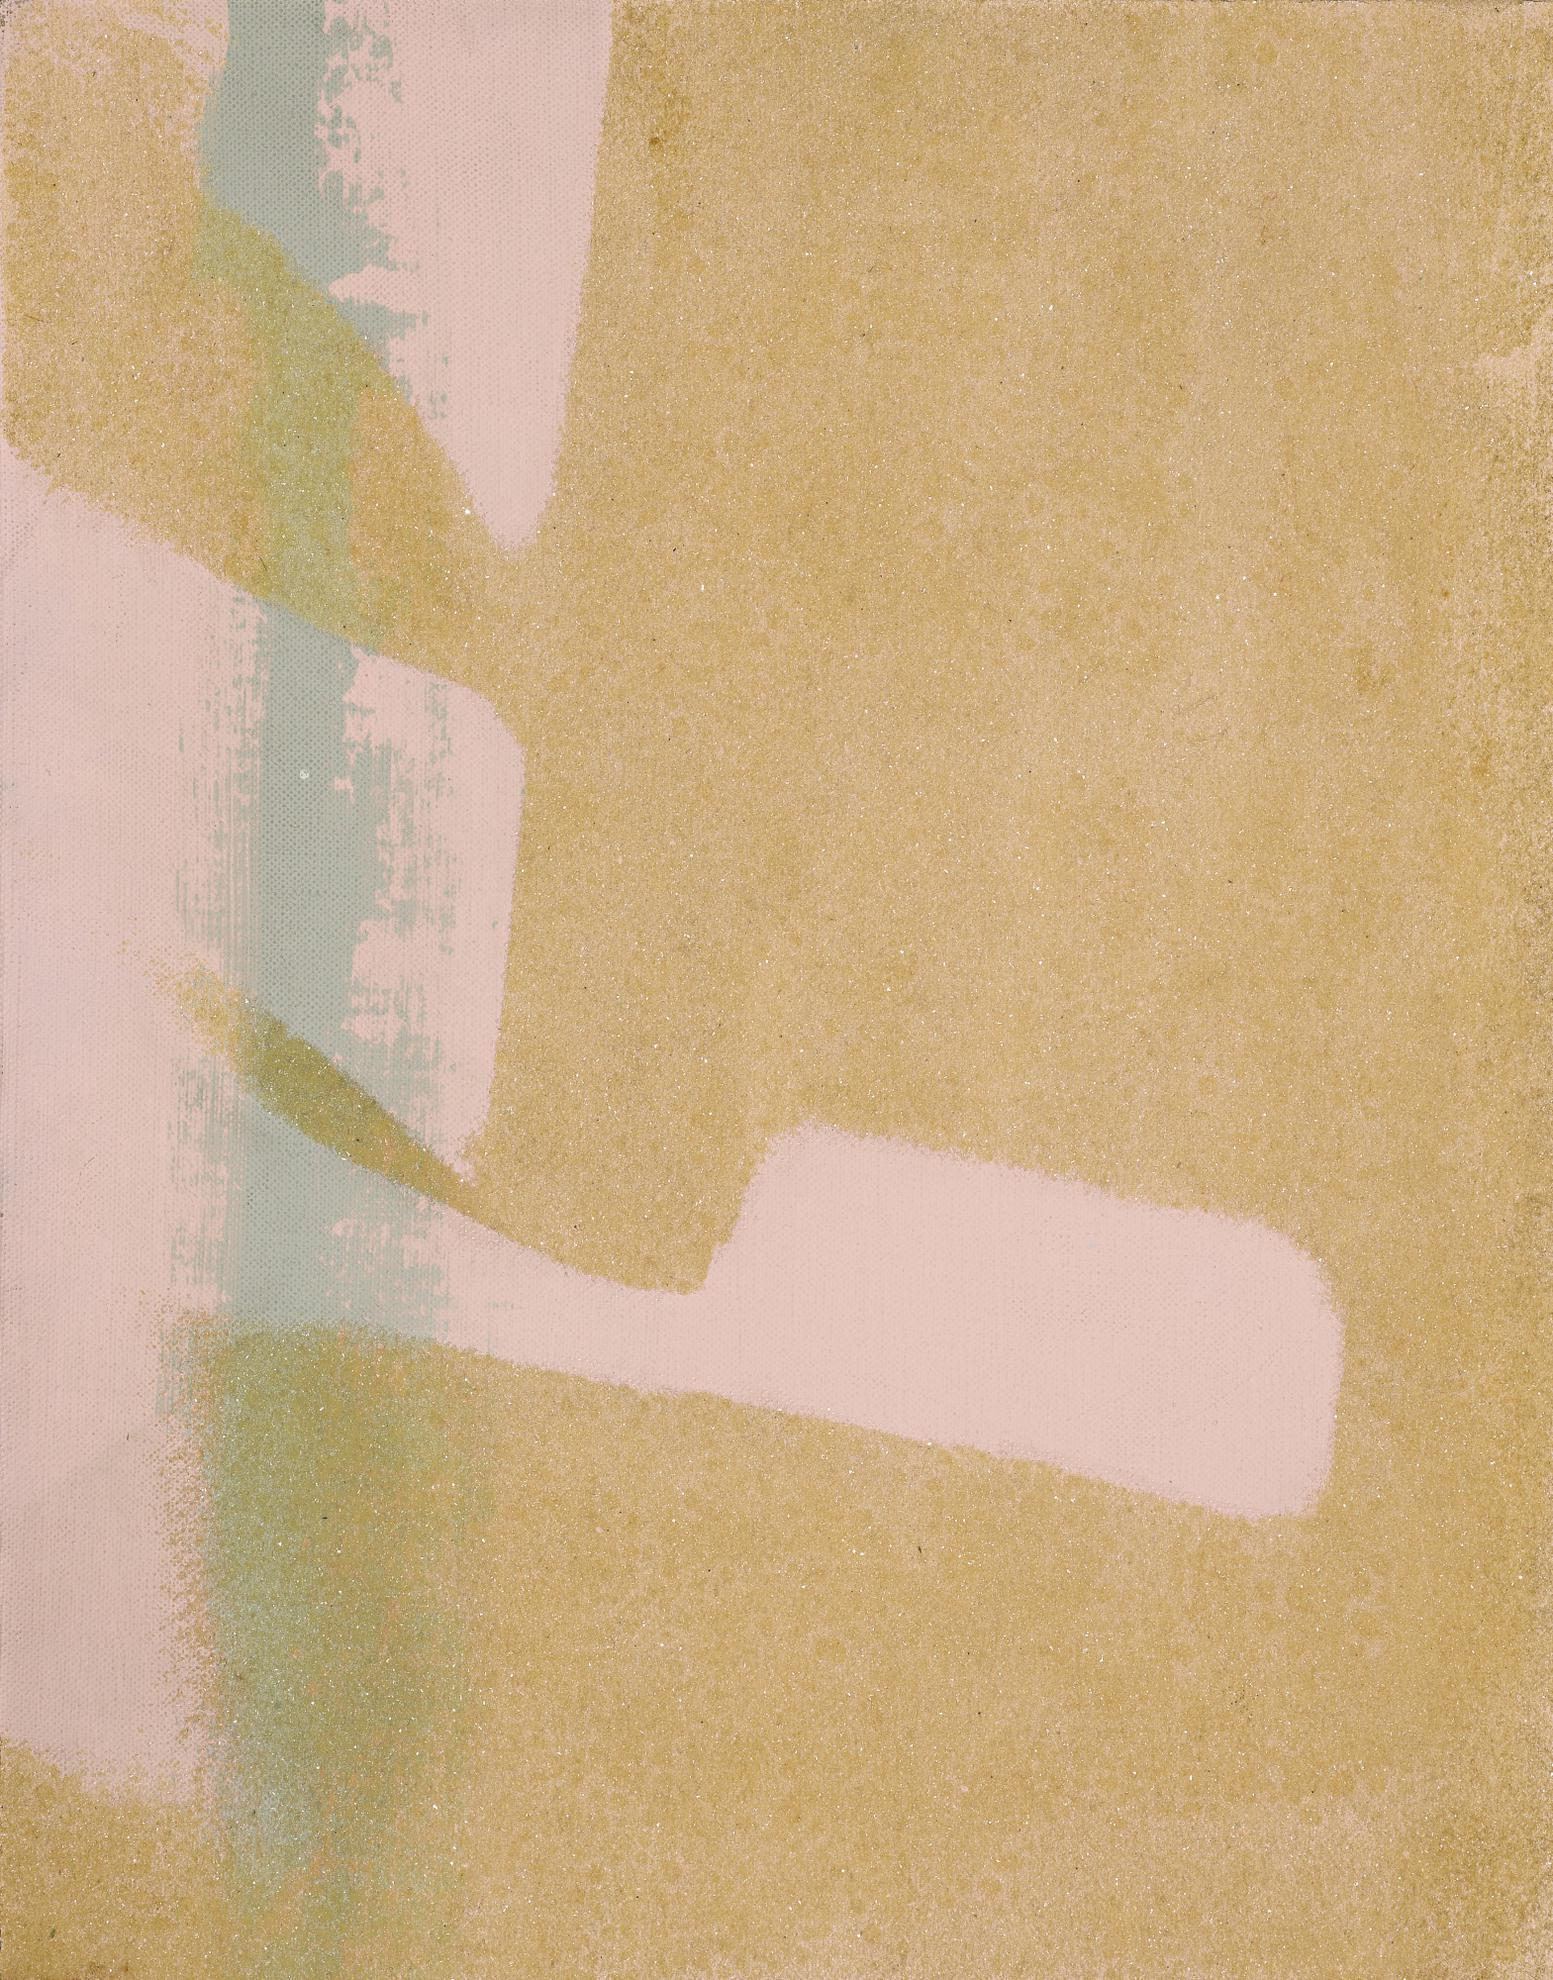 Andy Warhol-Diamond Dust Shadow-1979